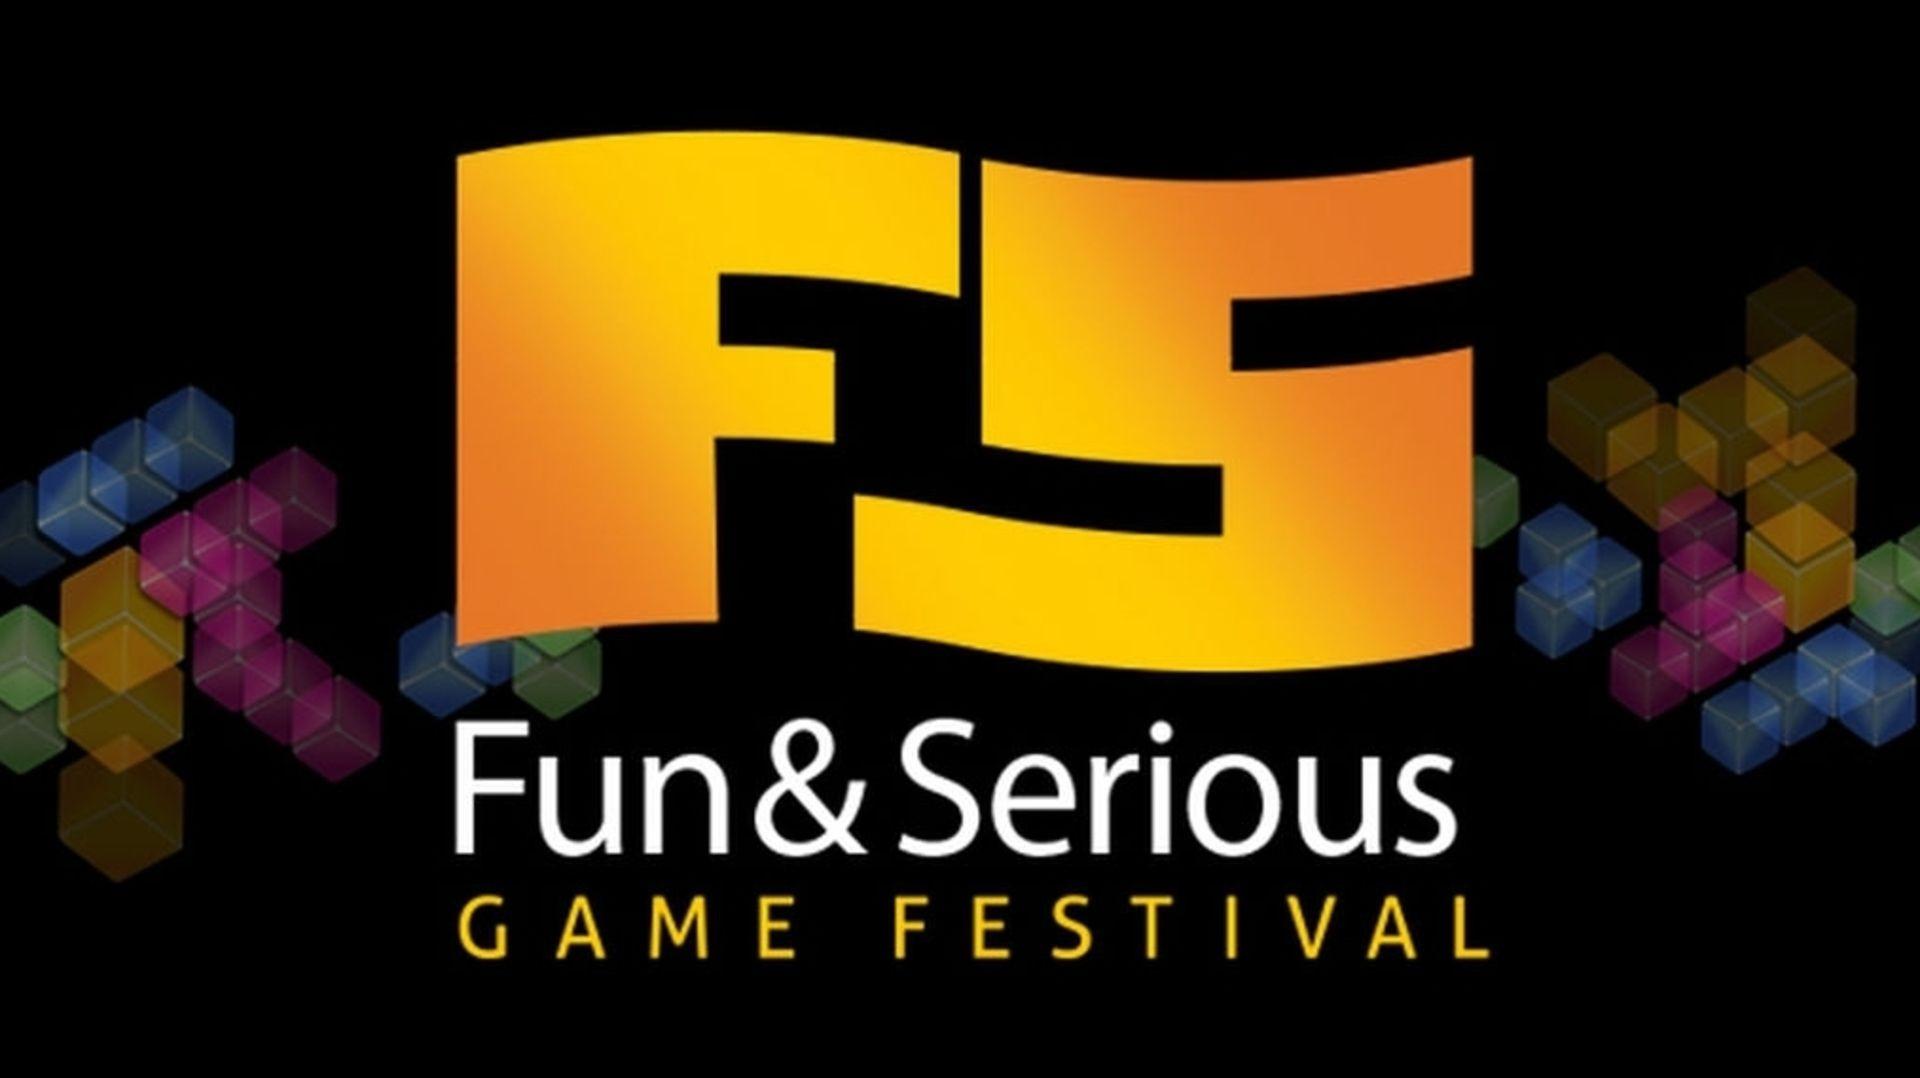 FUN&SERIOUS GAME FESTIVAL 2020